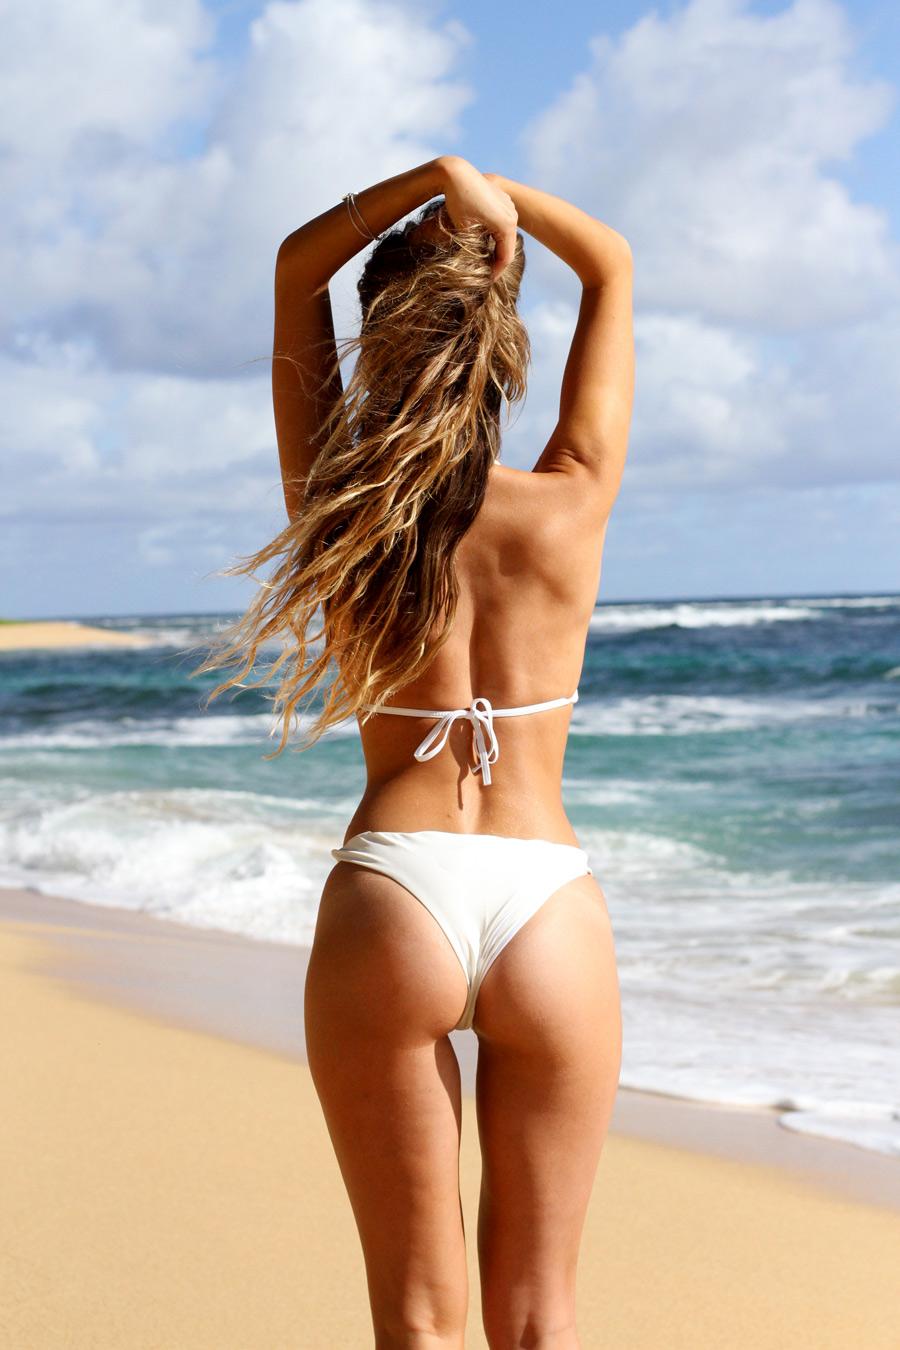 Beach in Kauai, Hawaii. Zaful review.